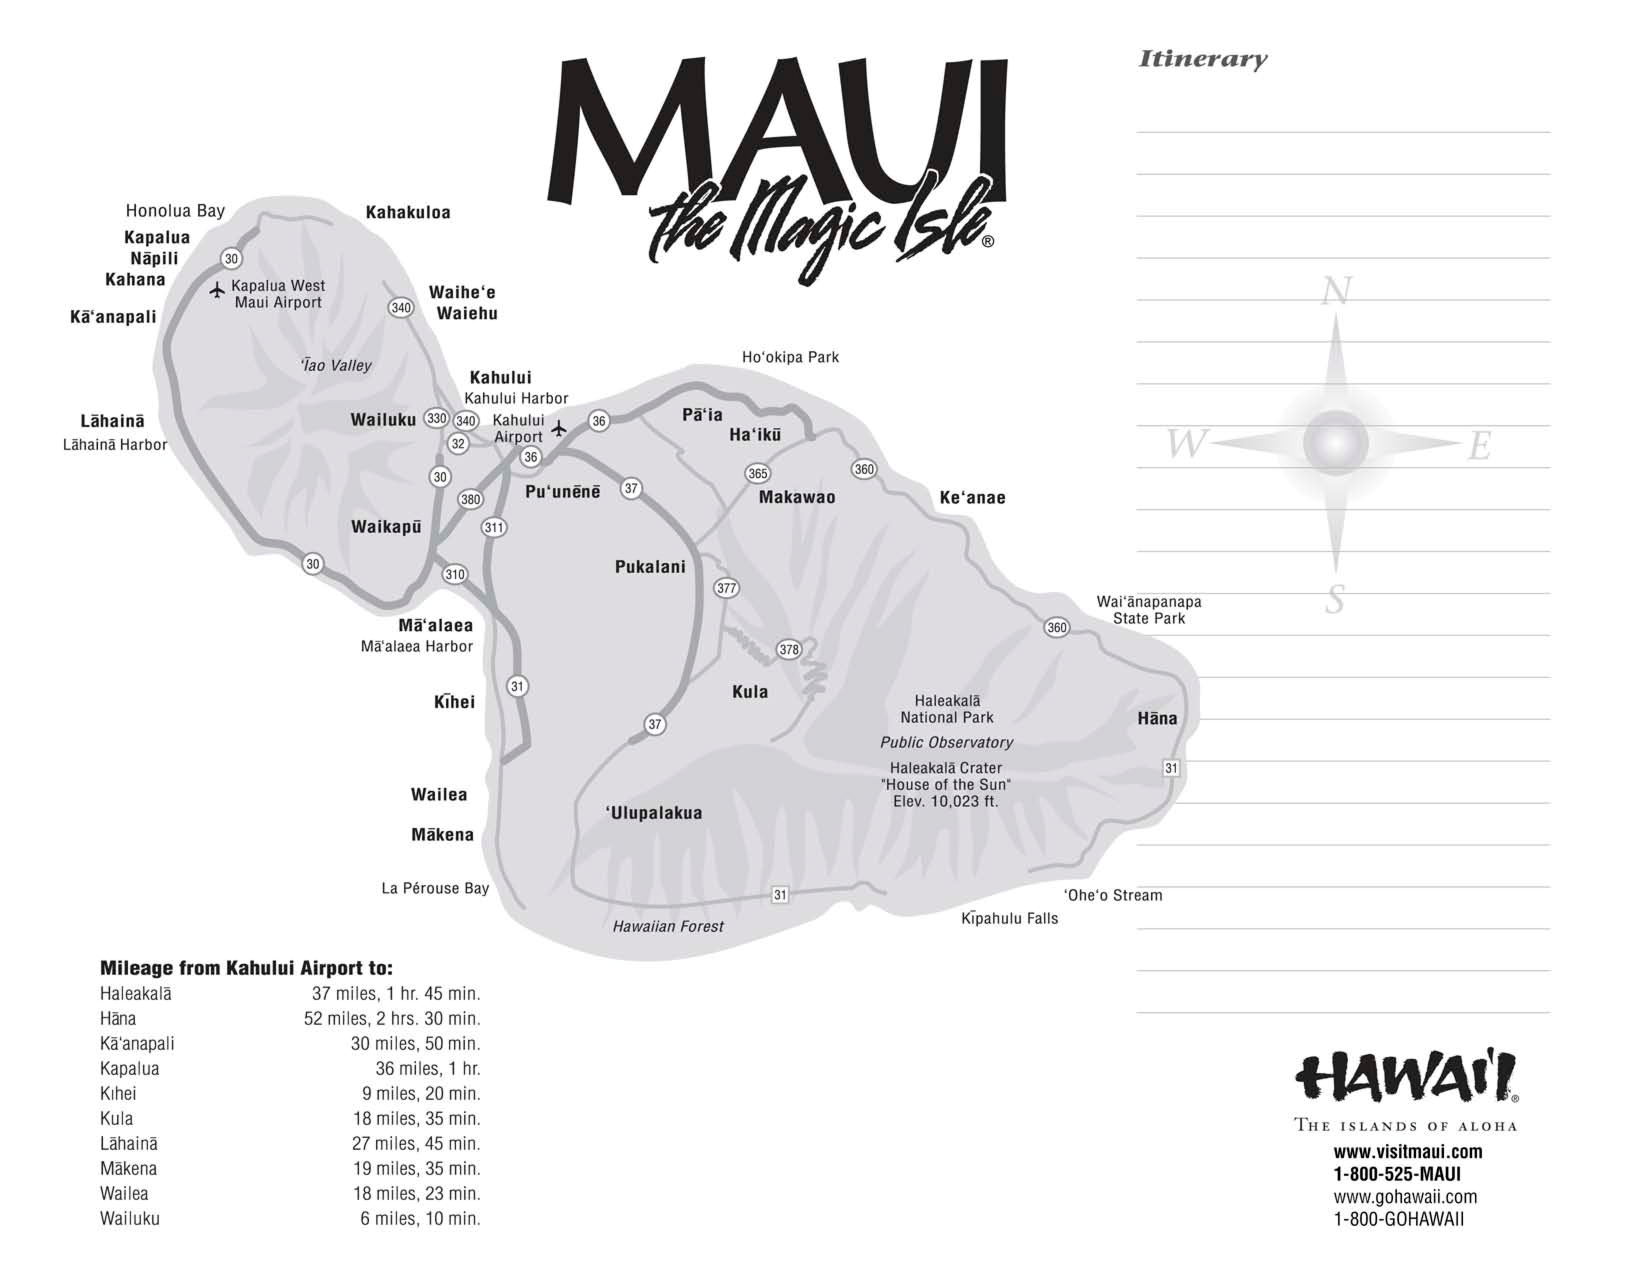 Maui Maps Printable | Scope Of Work Template Mileage | Hawaii - Maui Road Map Printable